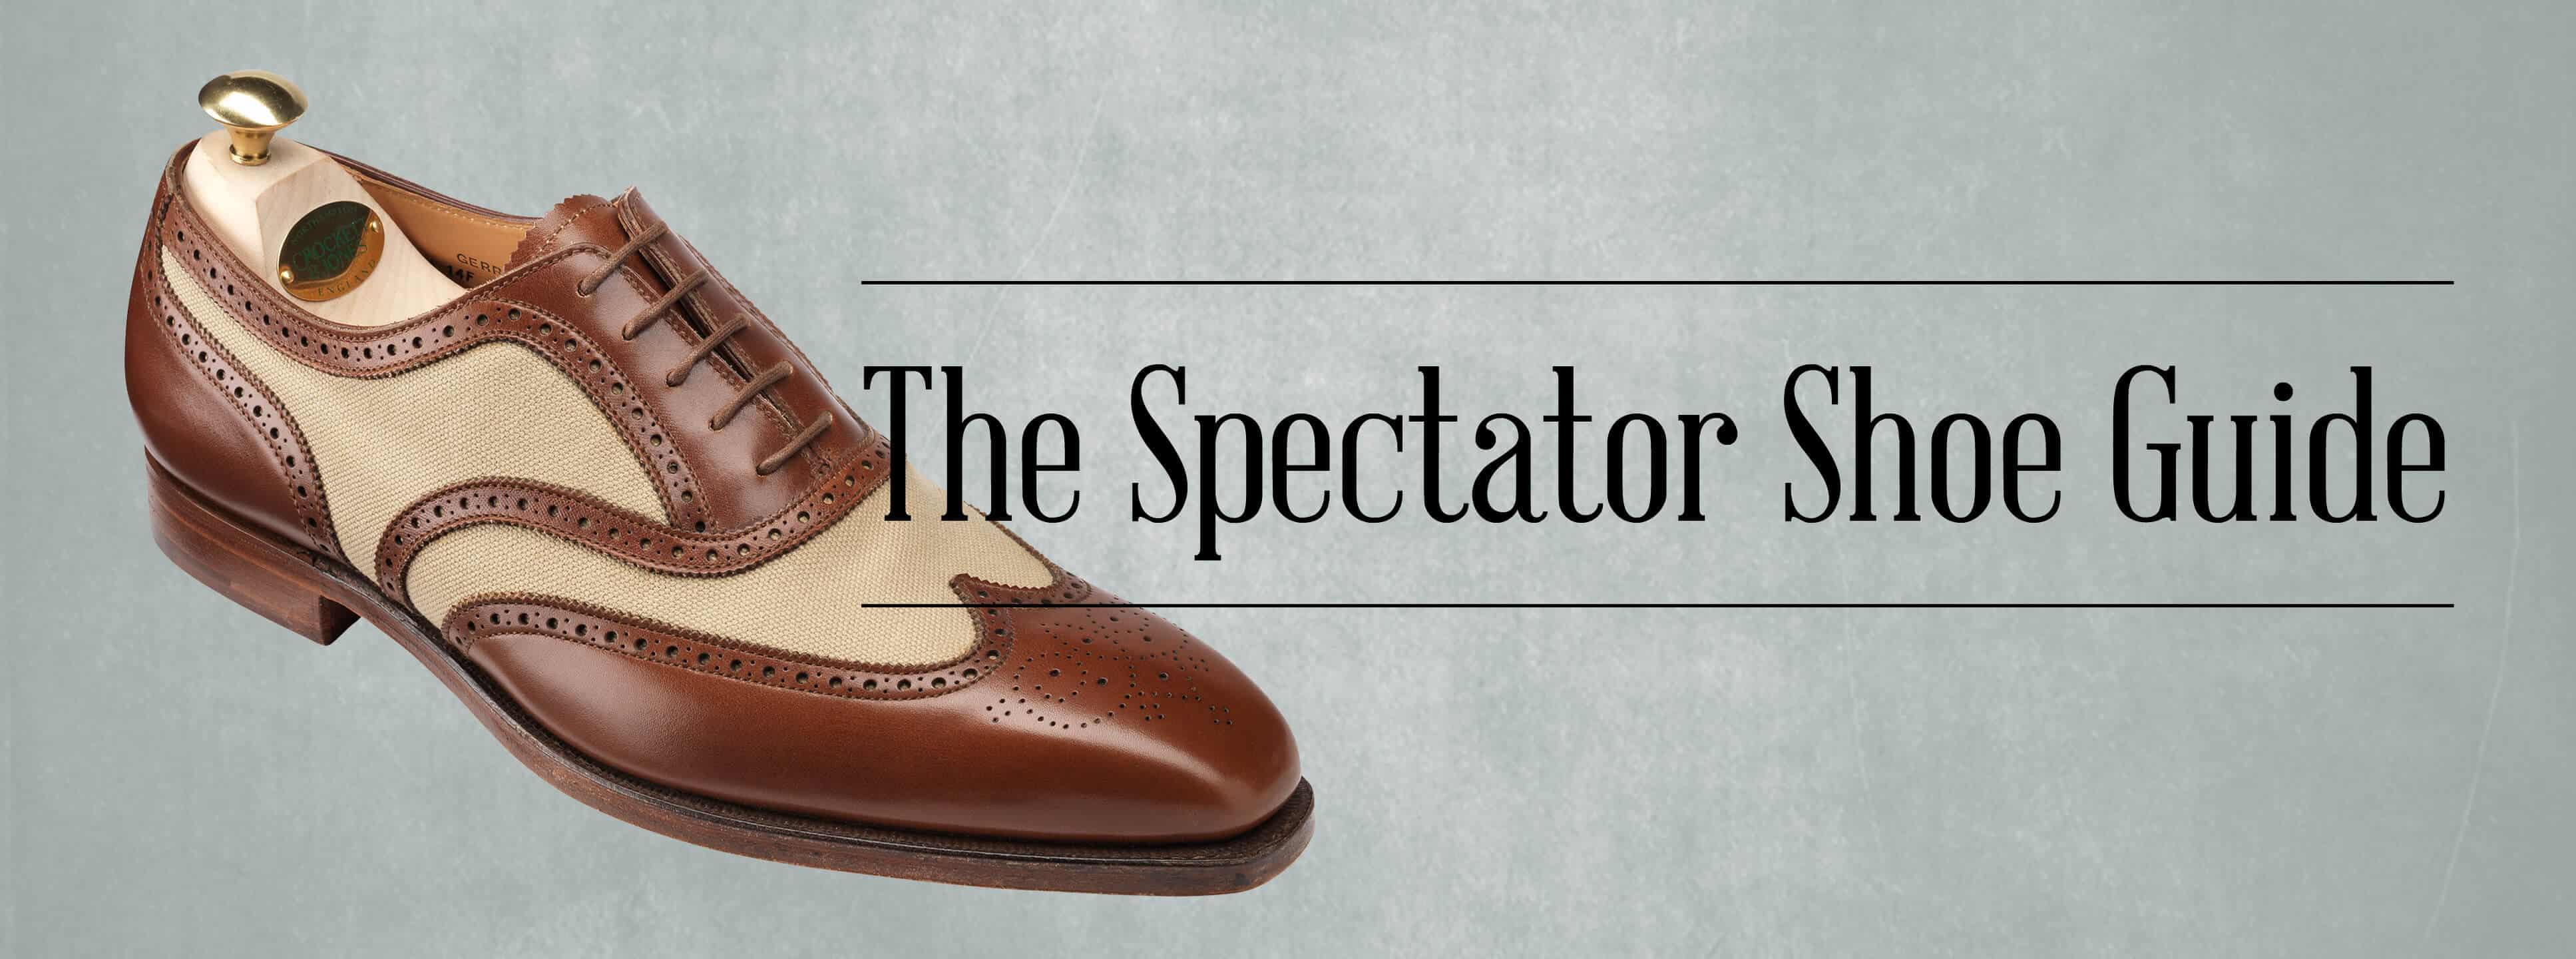 006c852eeb3b7 Spectator & Two Tone Shoes Guide — Gentleman's Gazette